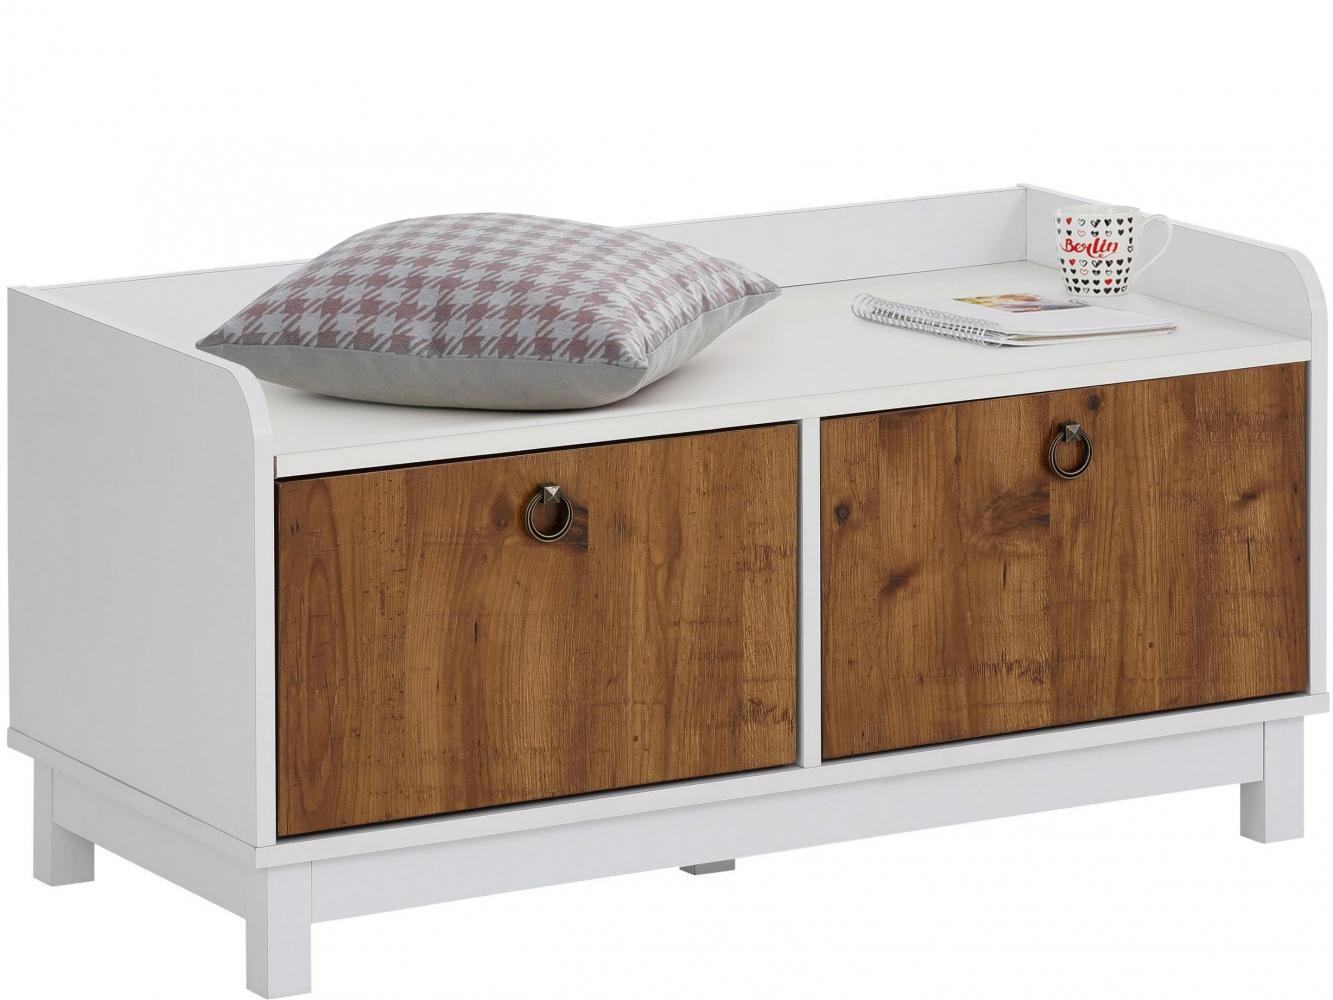 Úložná lavice Livat, 92 cm, bílá/dub